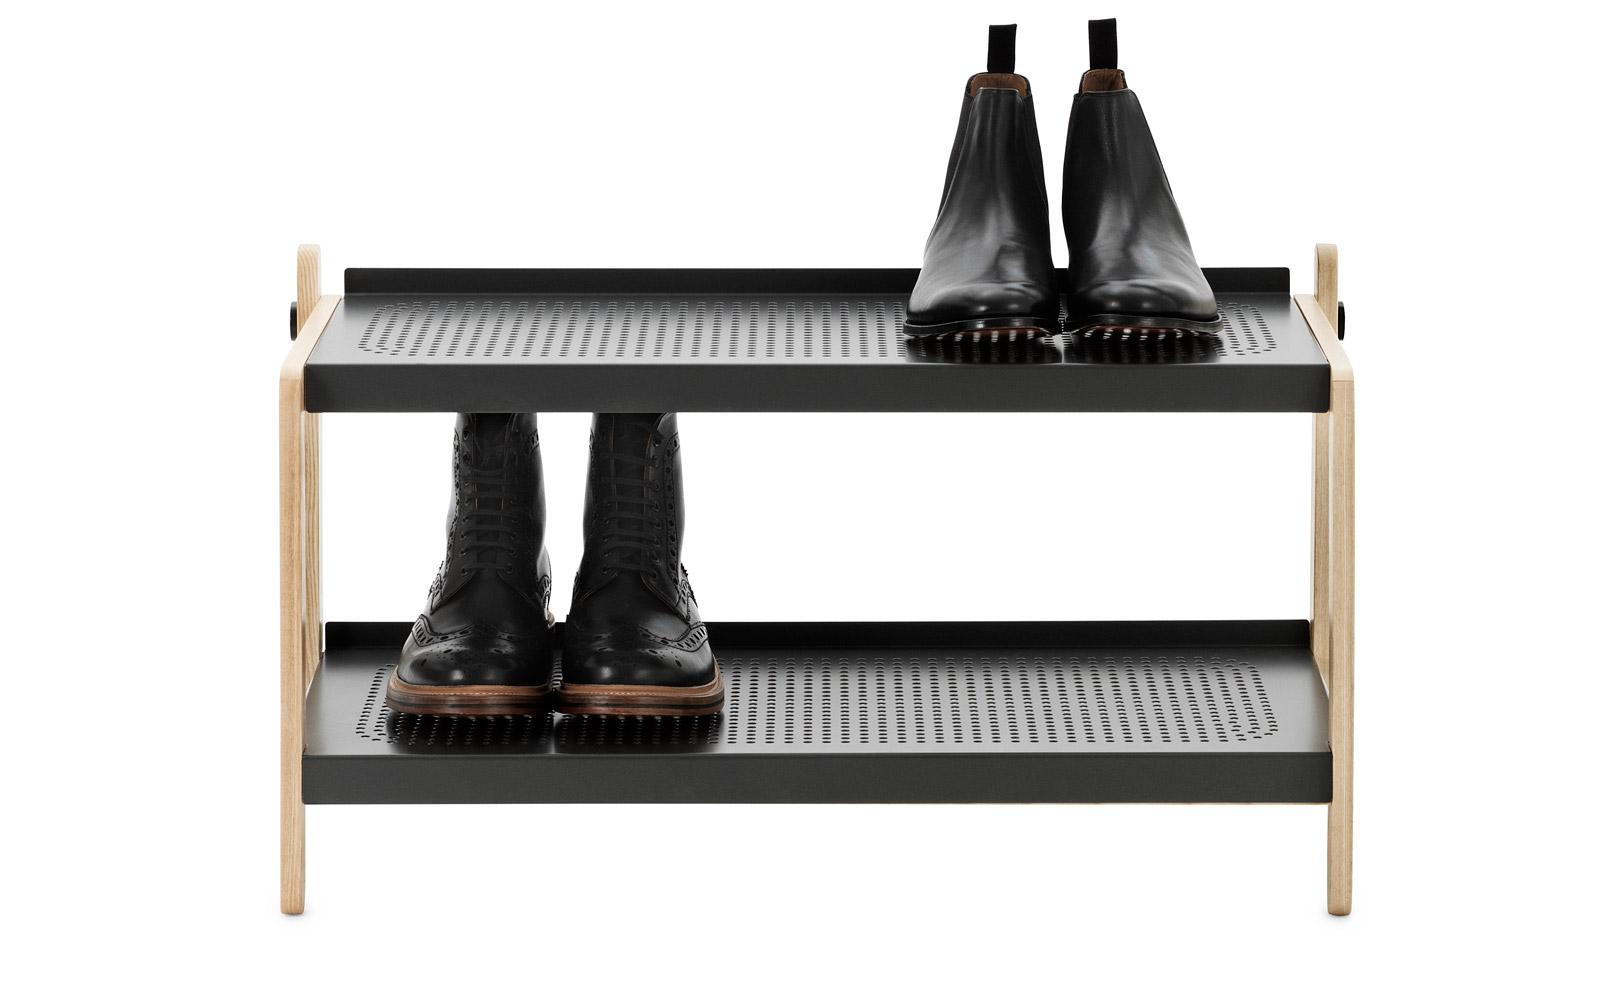 Sko Shoe Rack in white | Industrial design shoe storage